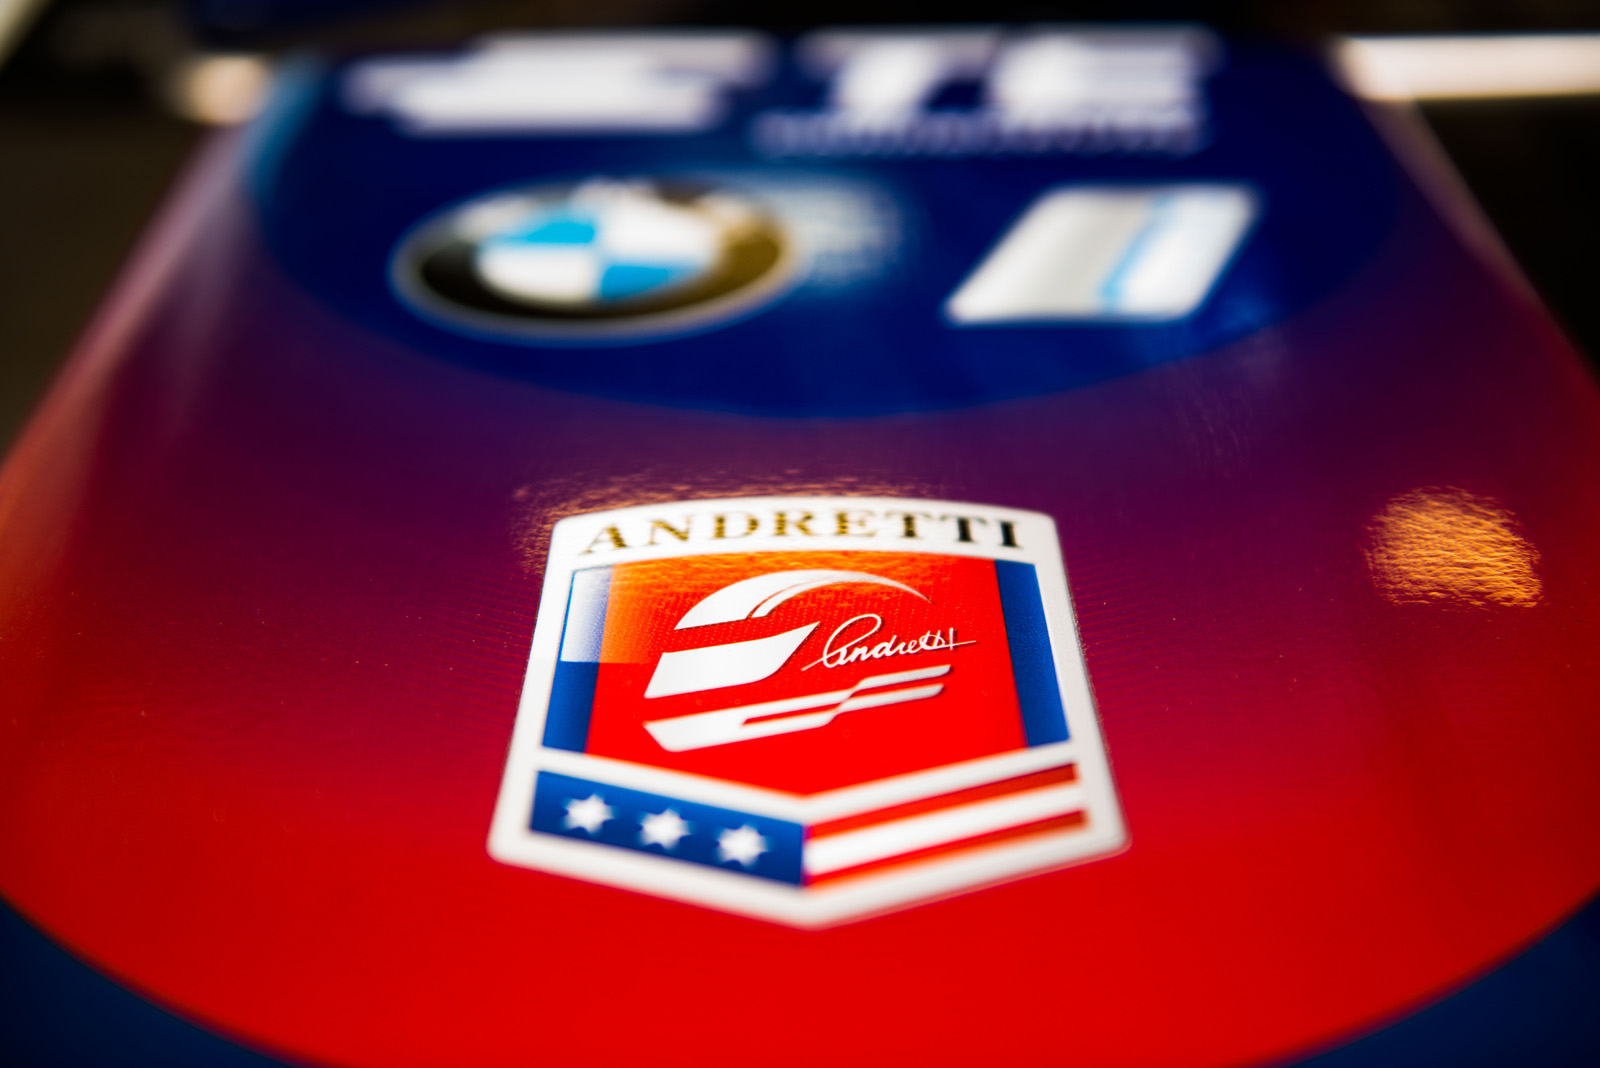 | Team: MS Amlin Andretti| Car: ATEC-02|| Photographer: Nat Twiss| Event: Mexico City ePrix| Circuit: Autodromo Hermanos Rodriguez| Location: Mexico City| Series: FIA Formula E| Season: 2016-2017| Country: MX|